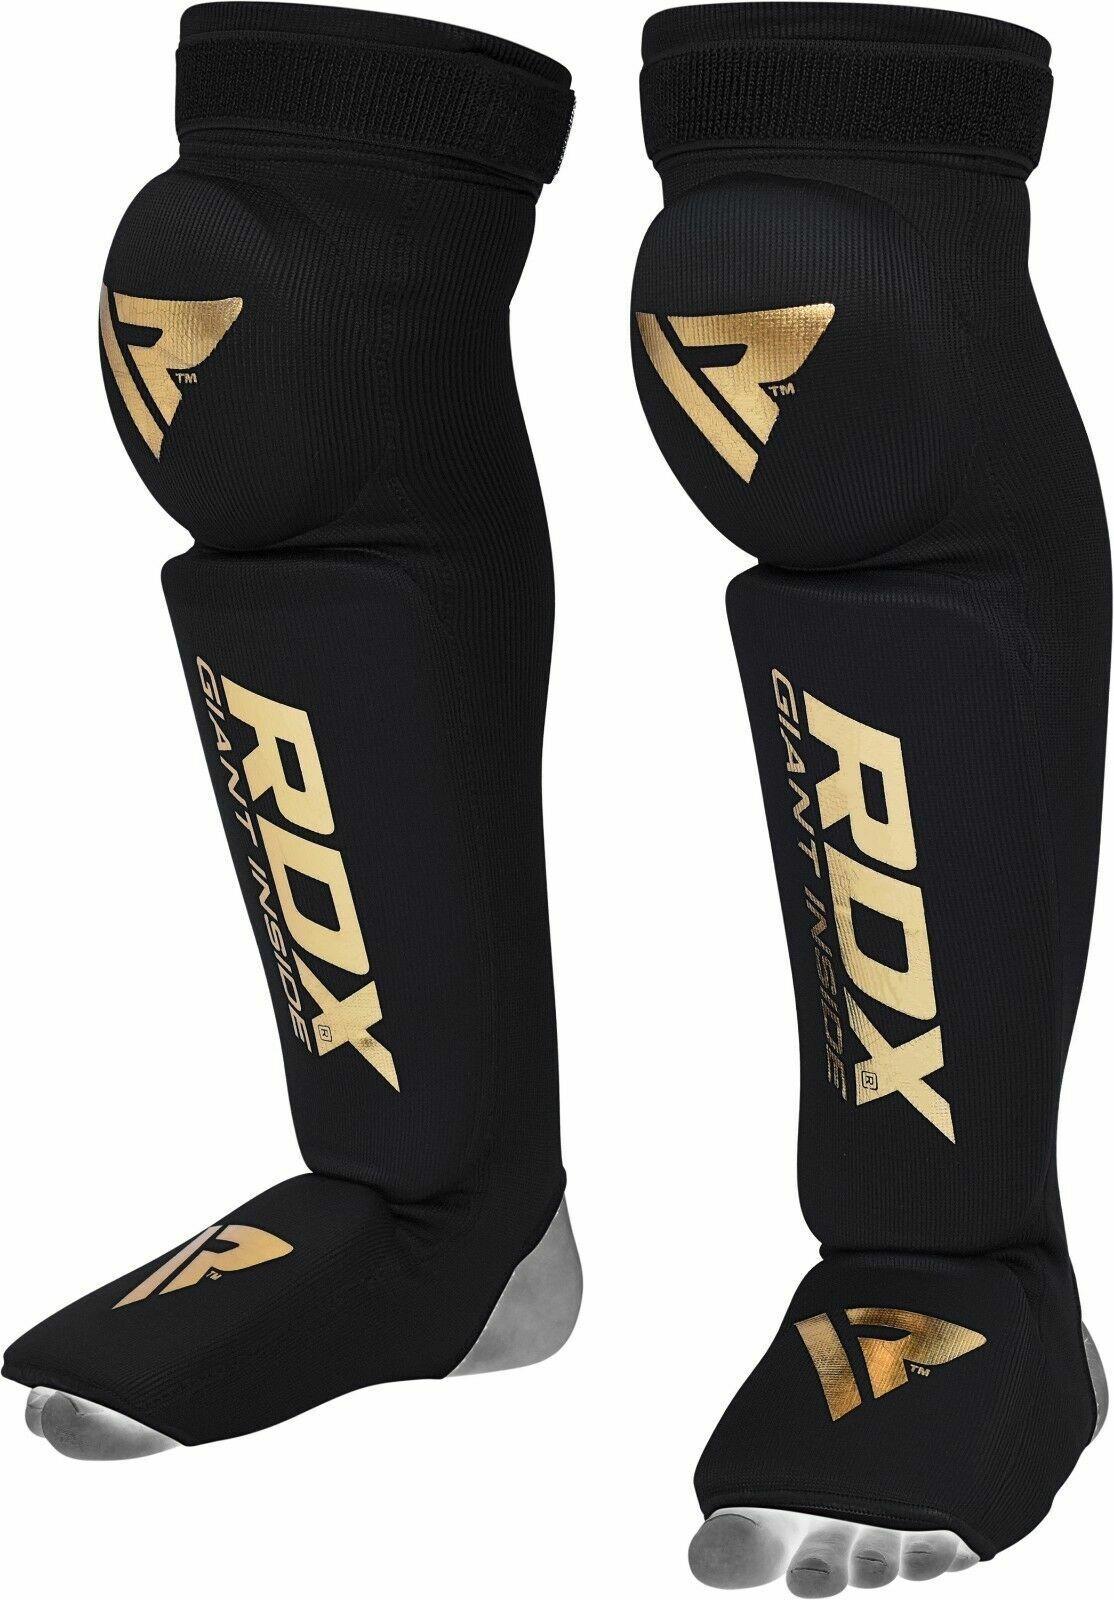 RDX Shin Guards Instep Foam Pad Boxing Knee Support Leg MMA